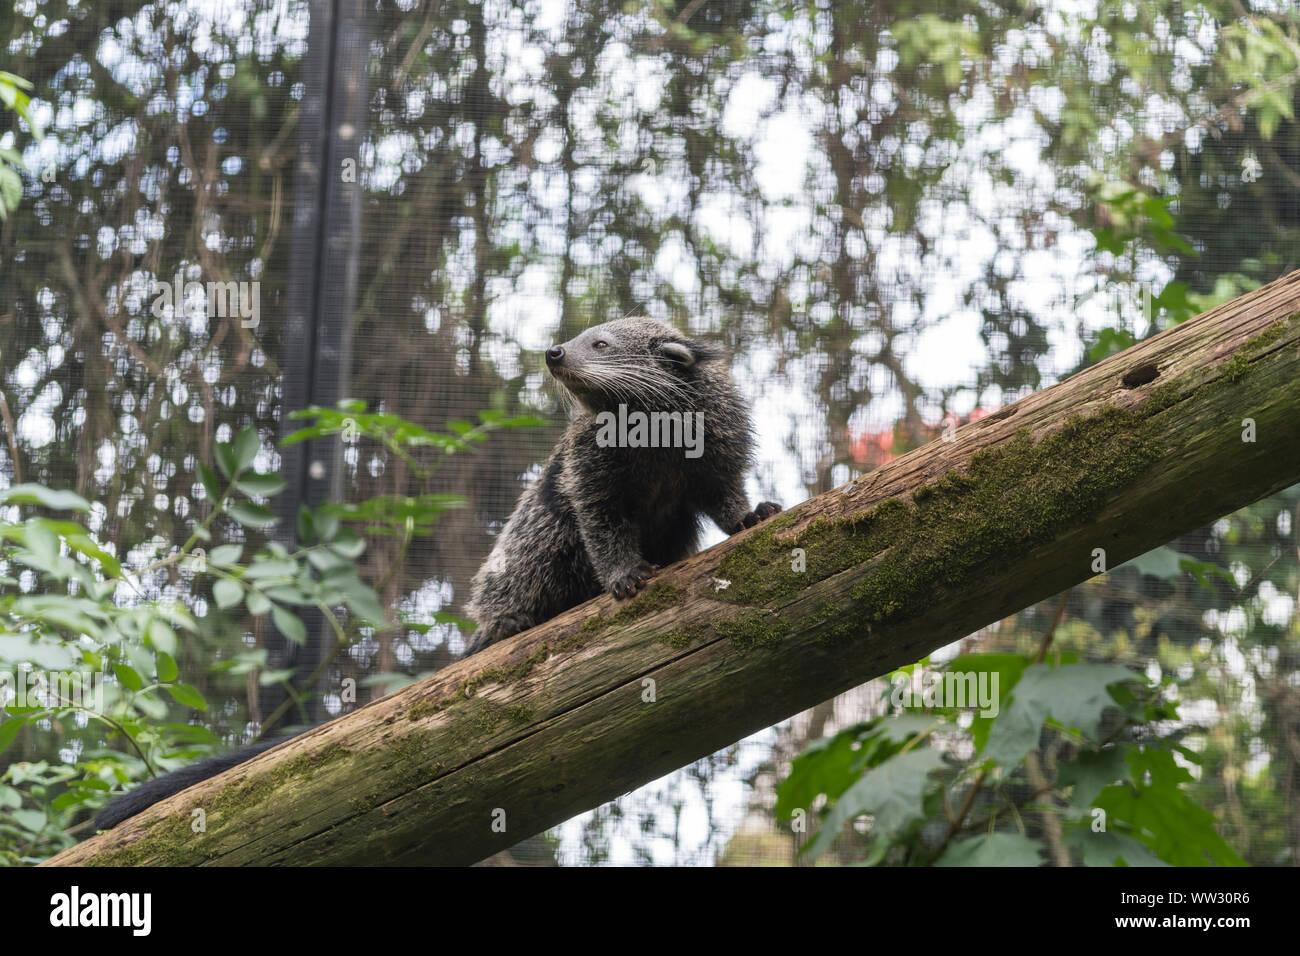 binturong-linton-zoo-conservation-park-cambridgeshire-2019-WW30R6.jpg